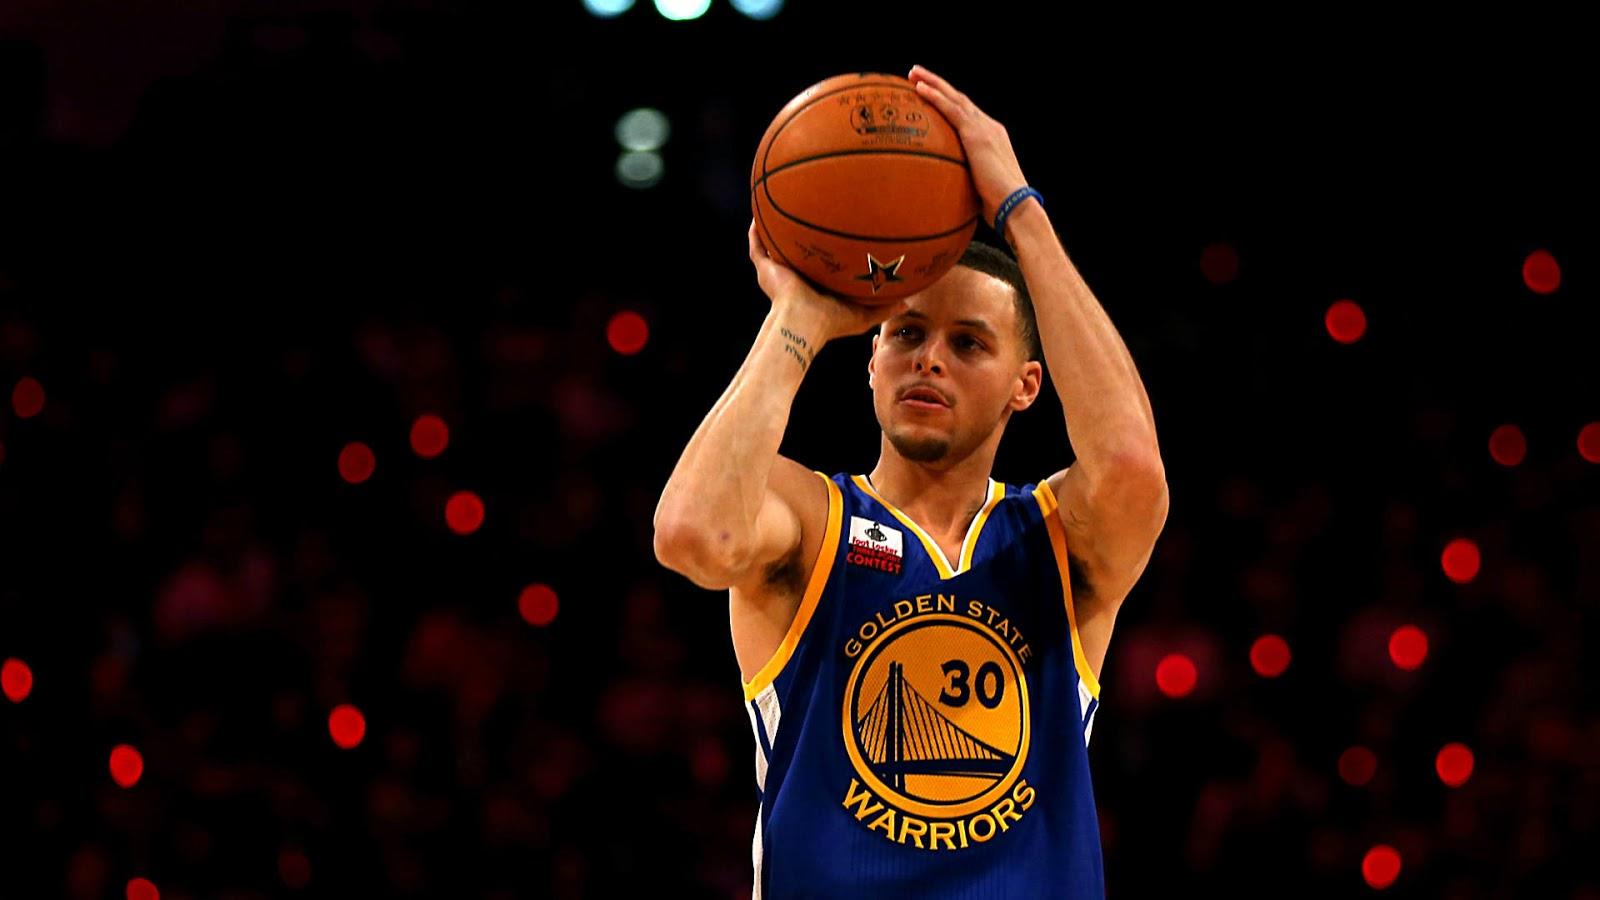 Basketball Star Player Stephen Curry Wallpaper